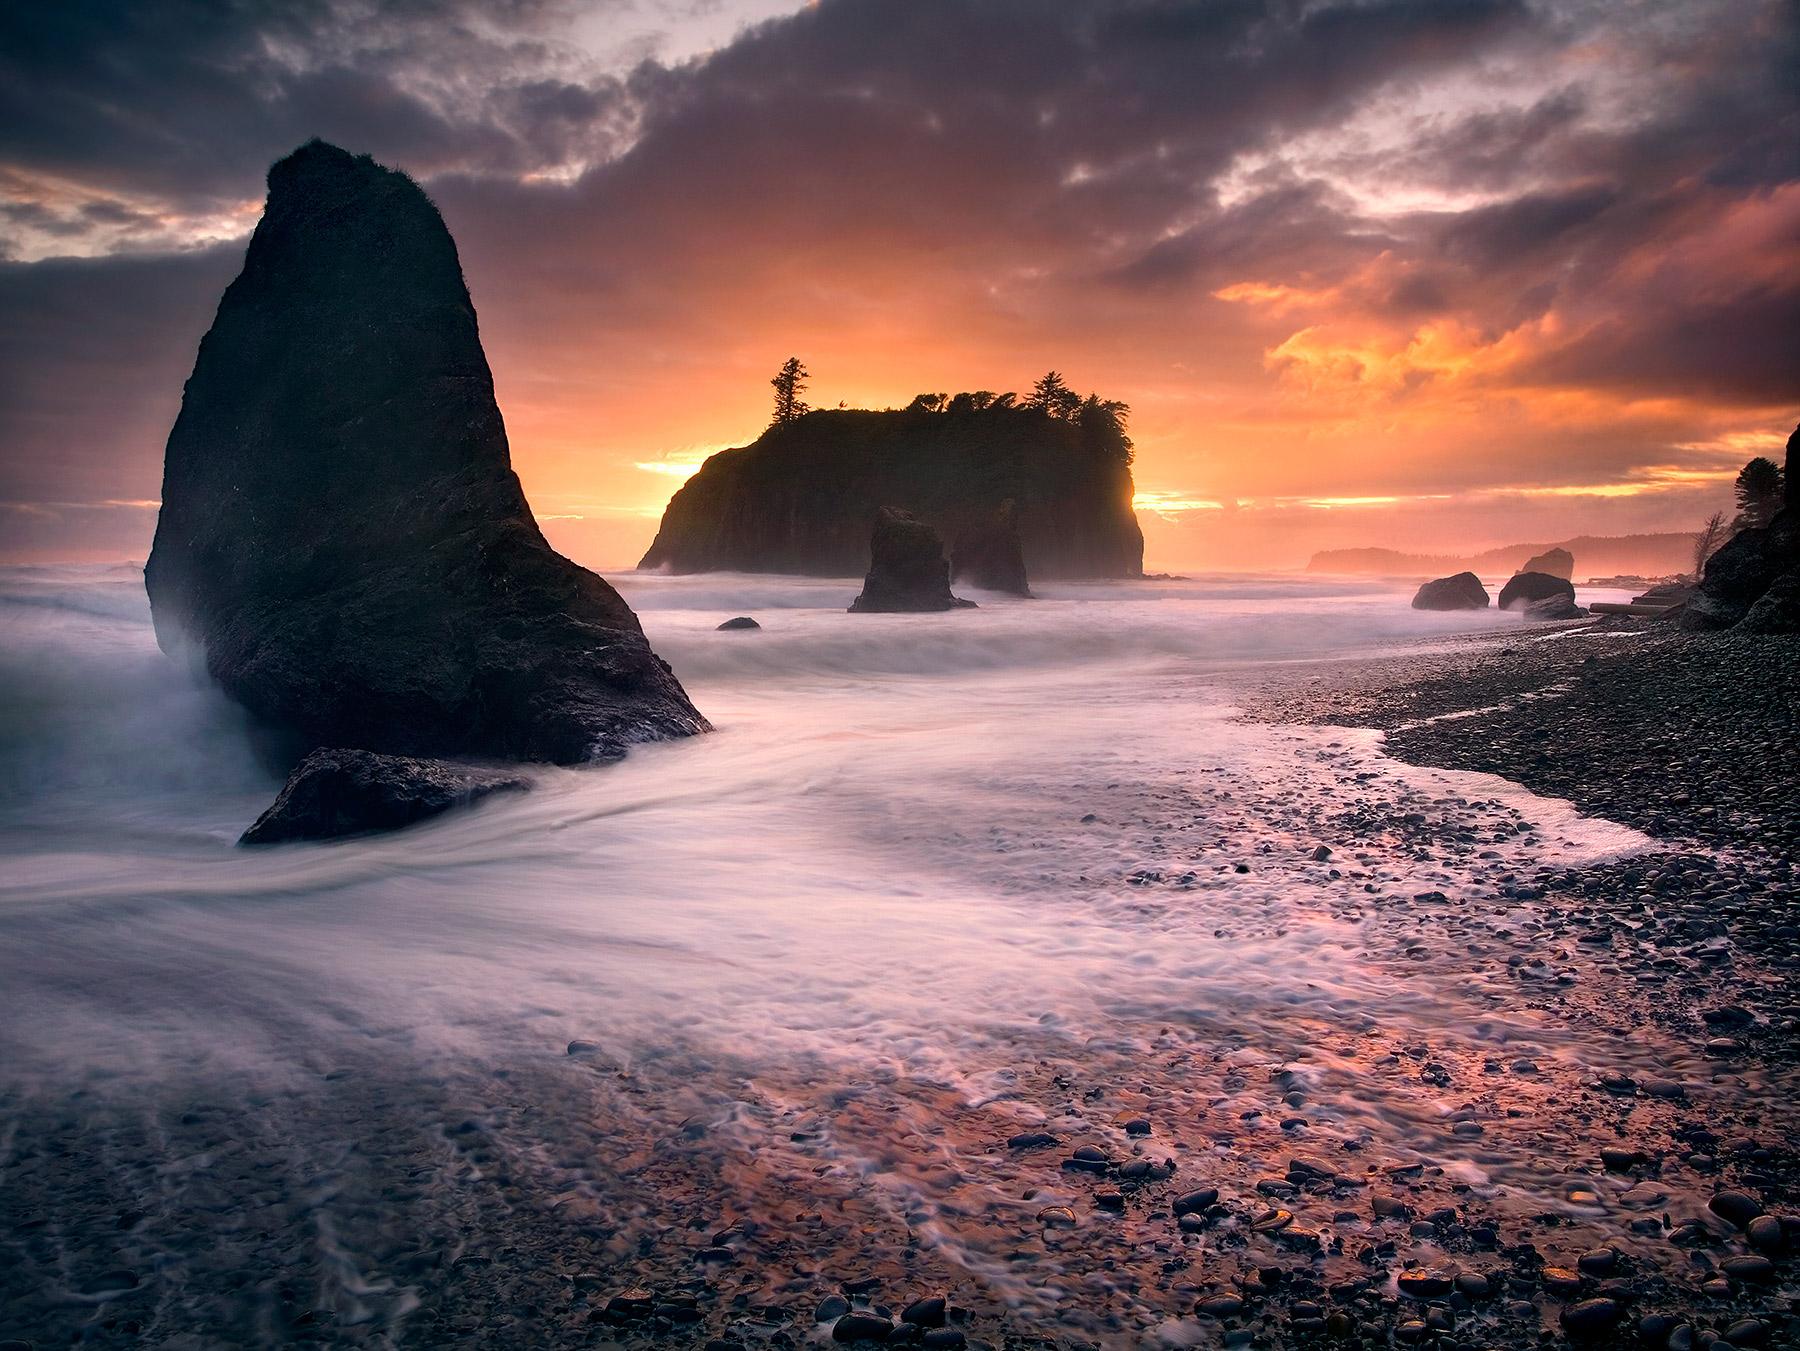 Receeding waves amidst a vibrant sunset captured at Washington's famous Ruby Beach.